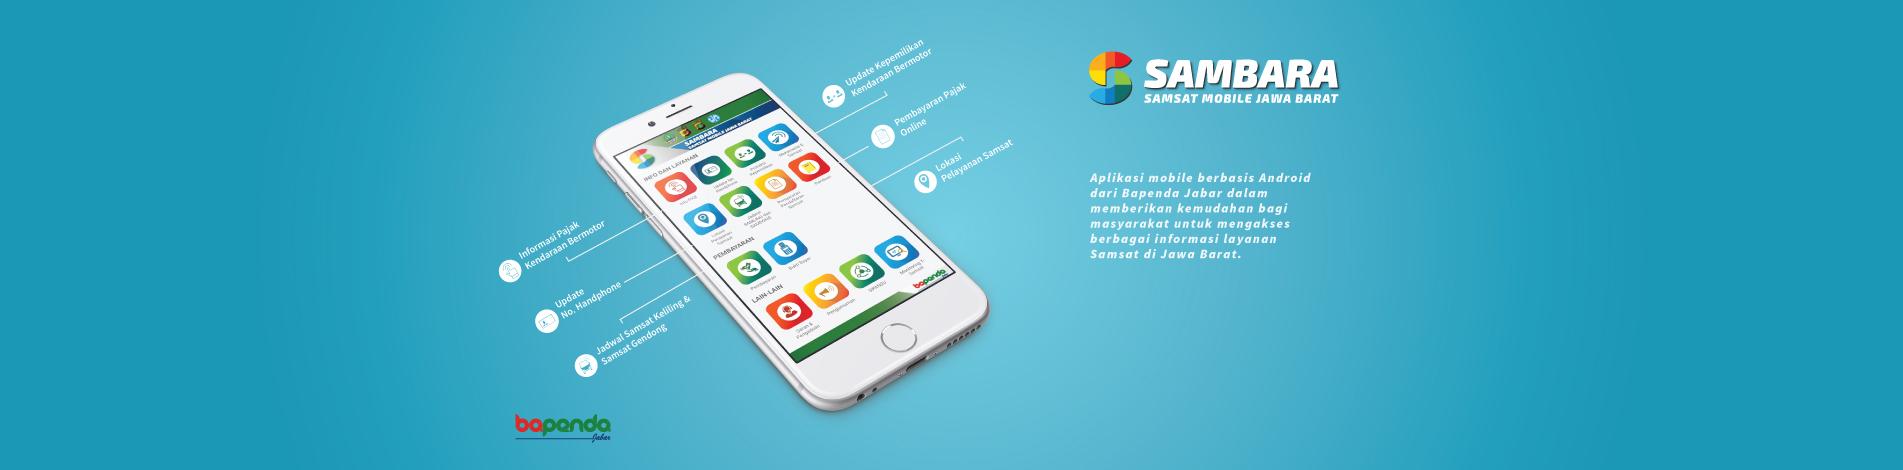 Samsat-Mobile-Jabar